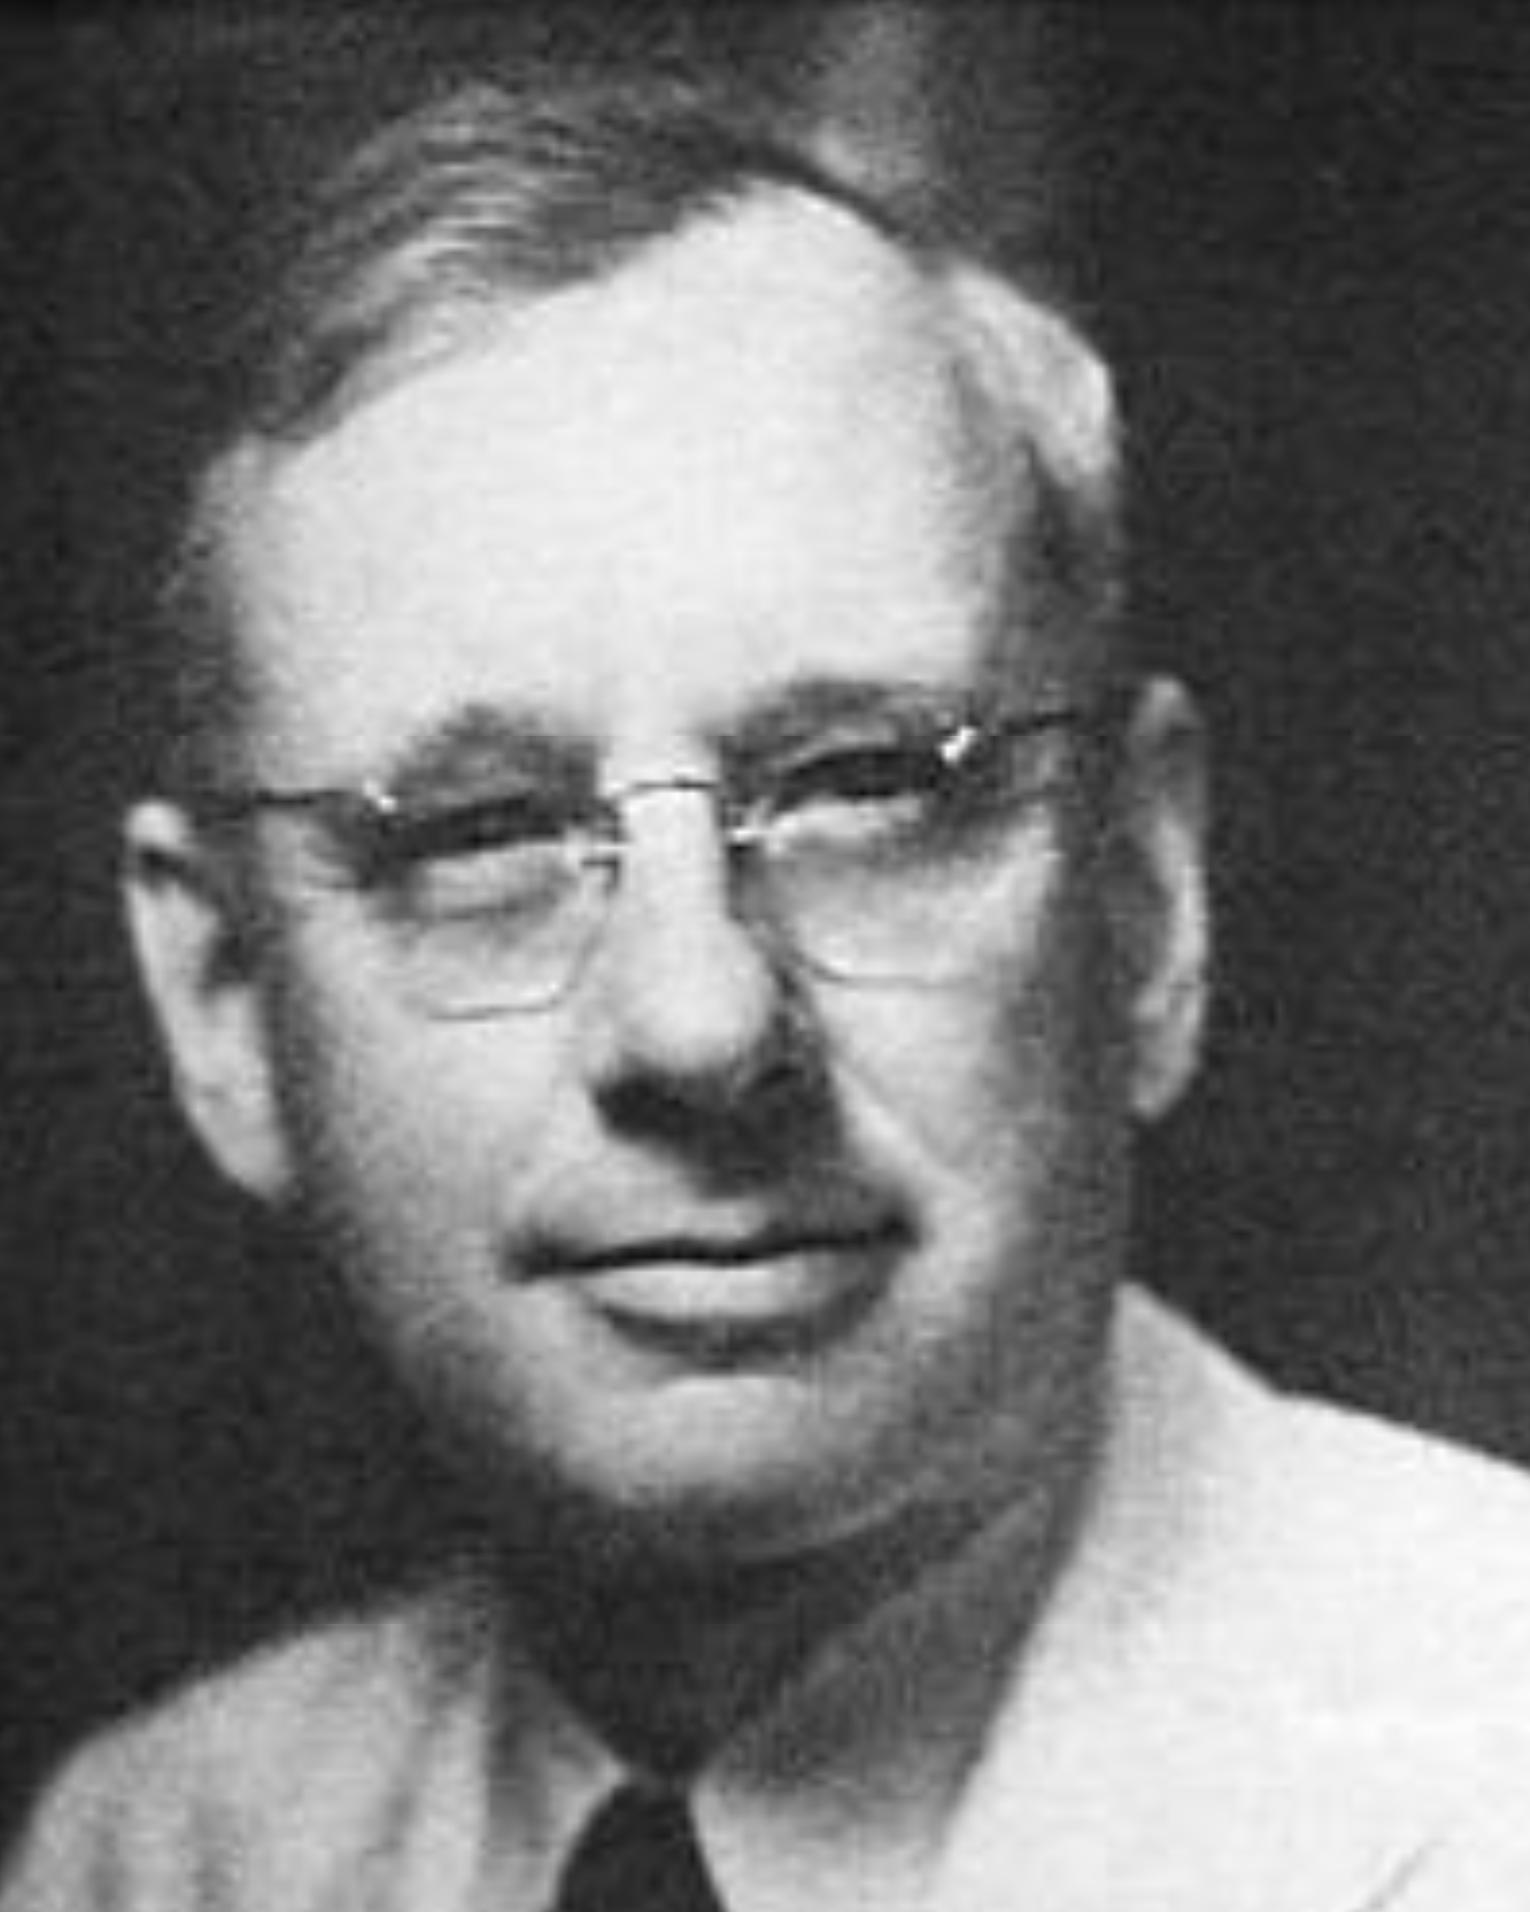 ALFRED M. LANDON